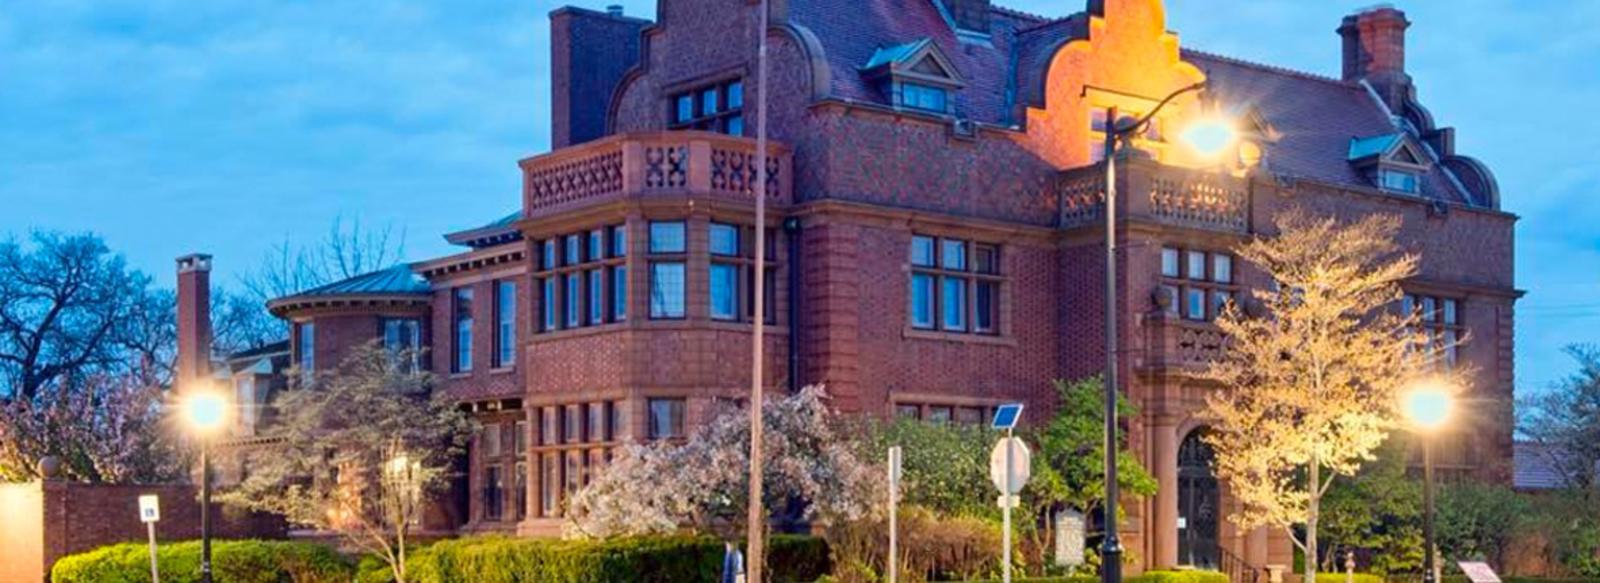 Barker Mansion Michigan City Museum & Historic Home